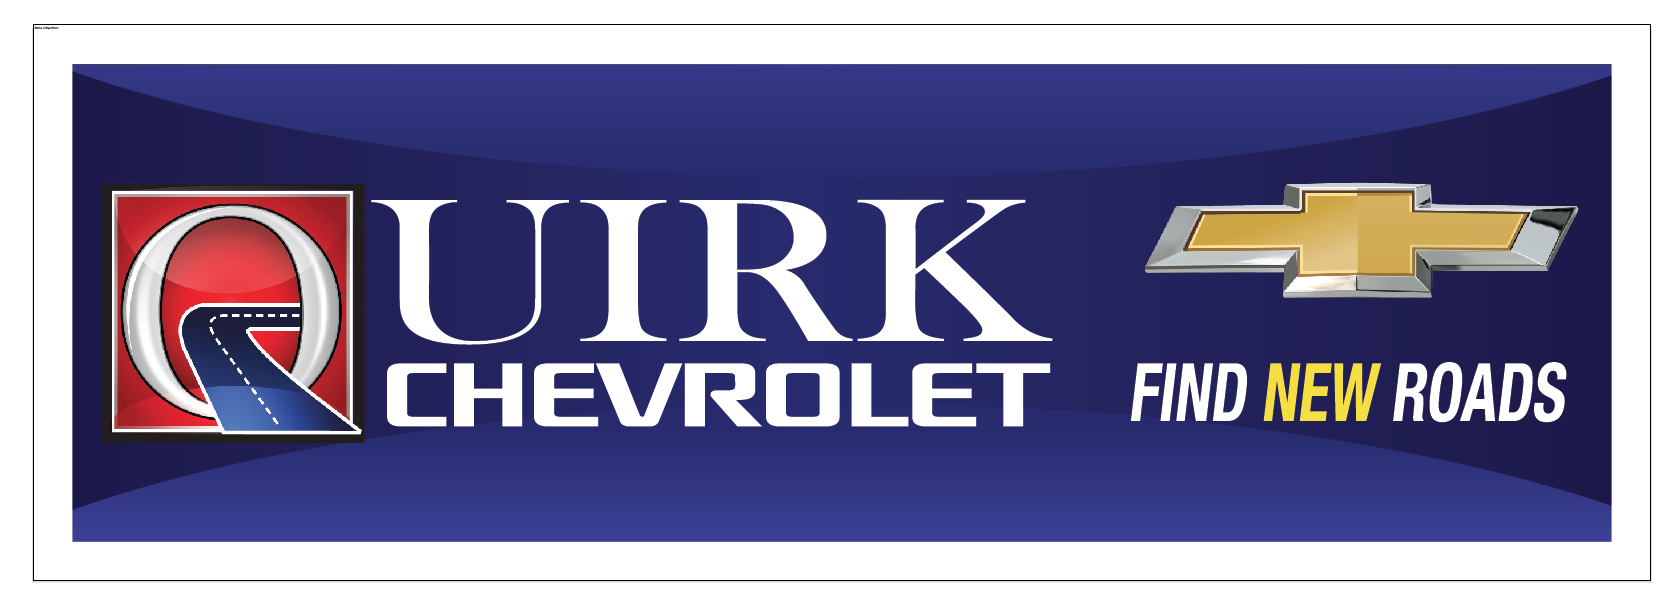 Quirk Chevrolet